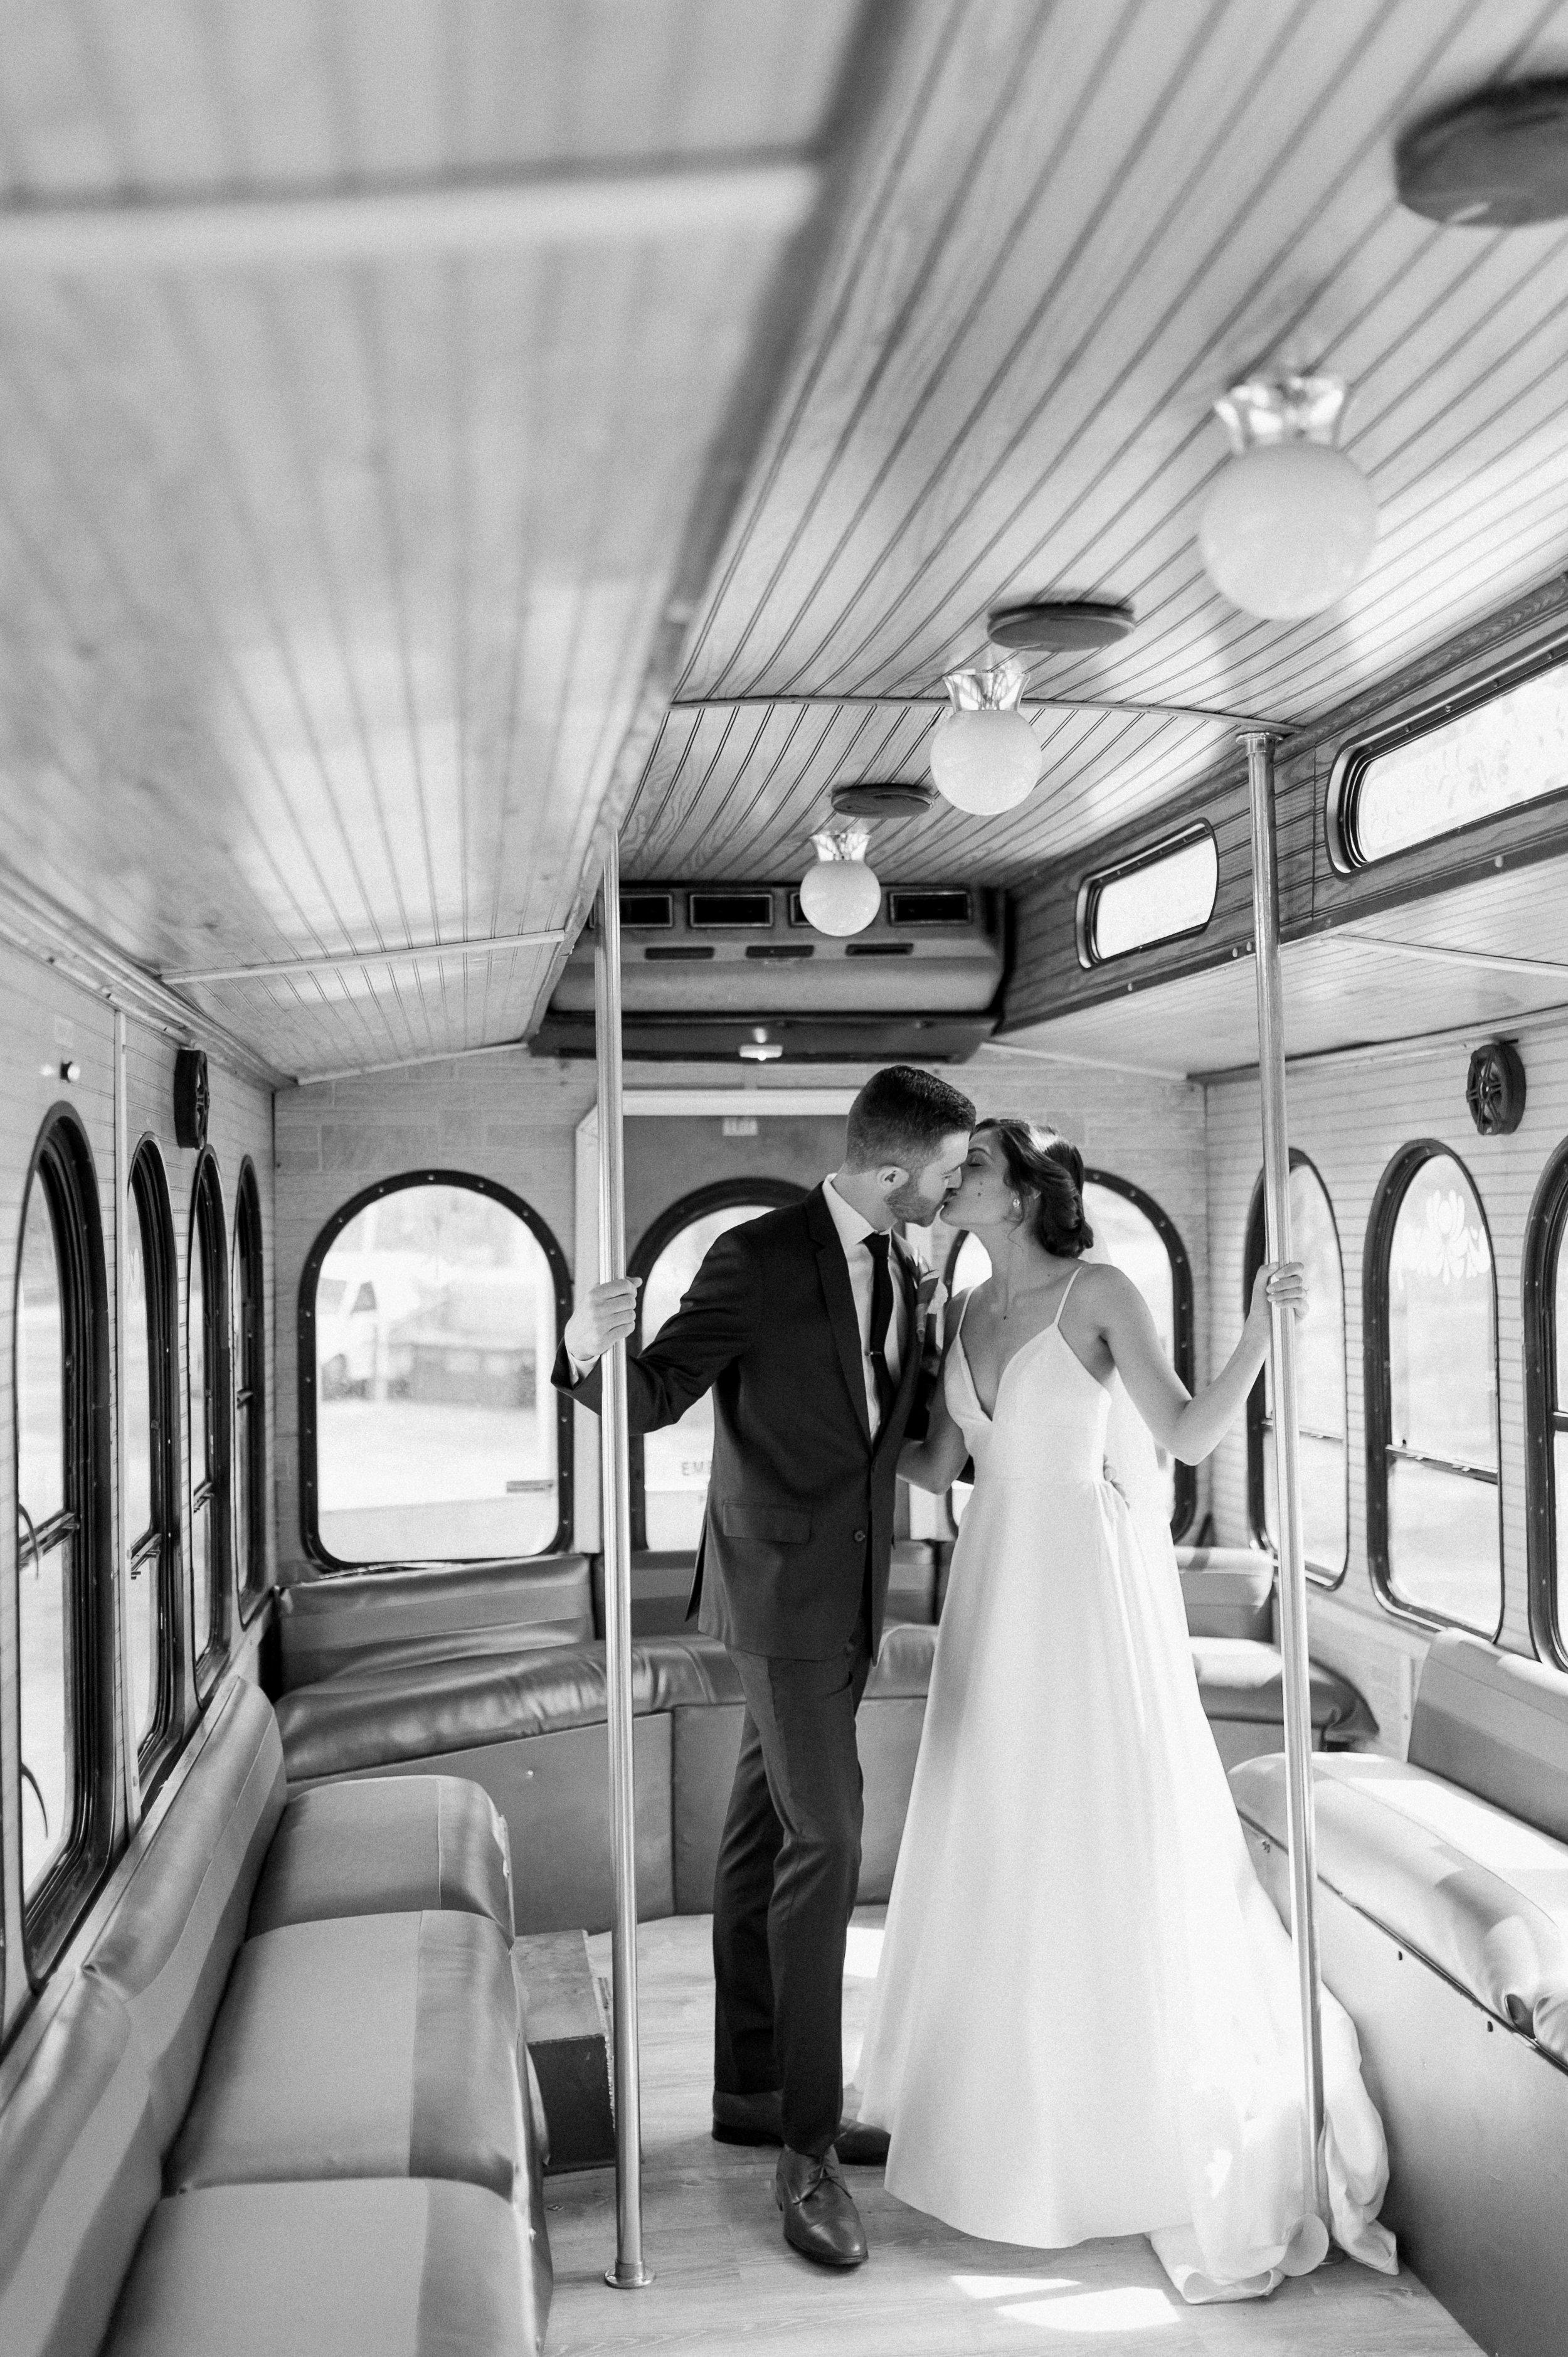 essex steam train wedding photos_lace factory wedding photos steam train_essex steam train